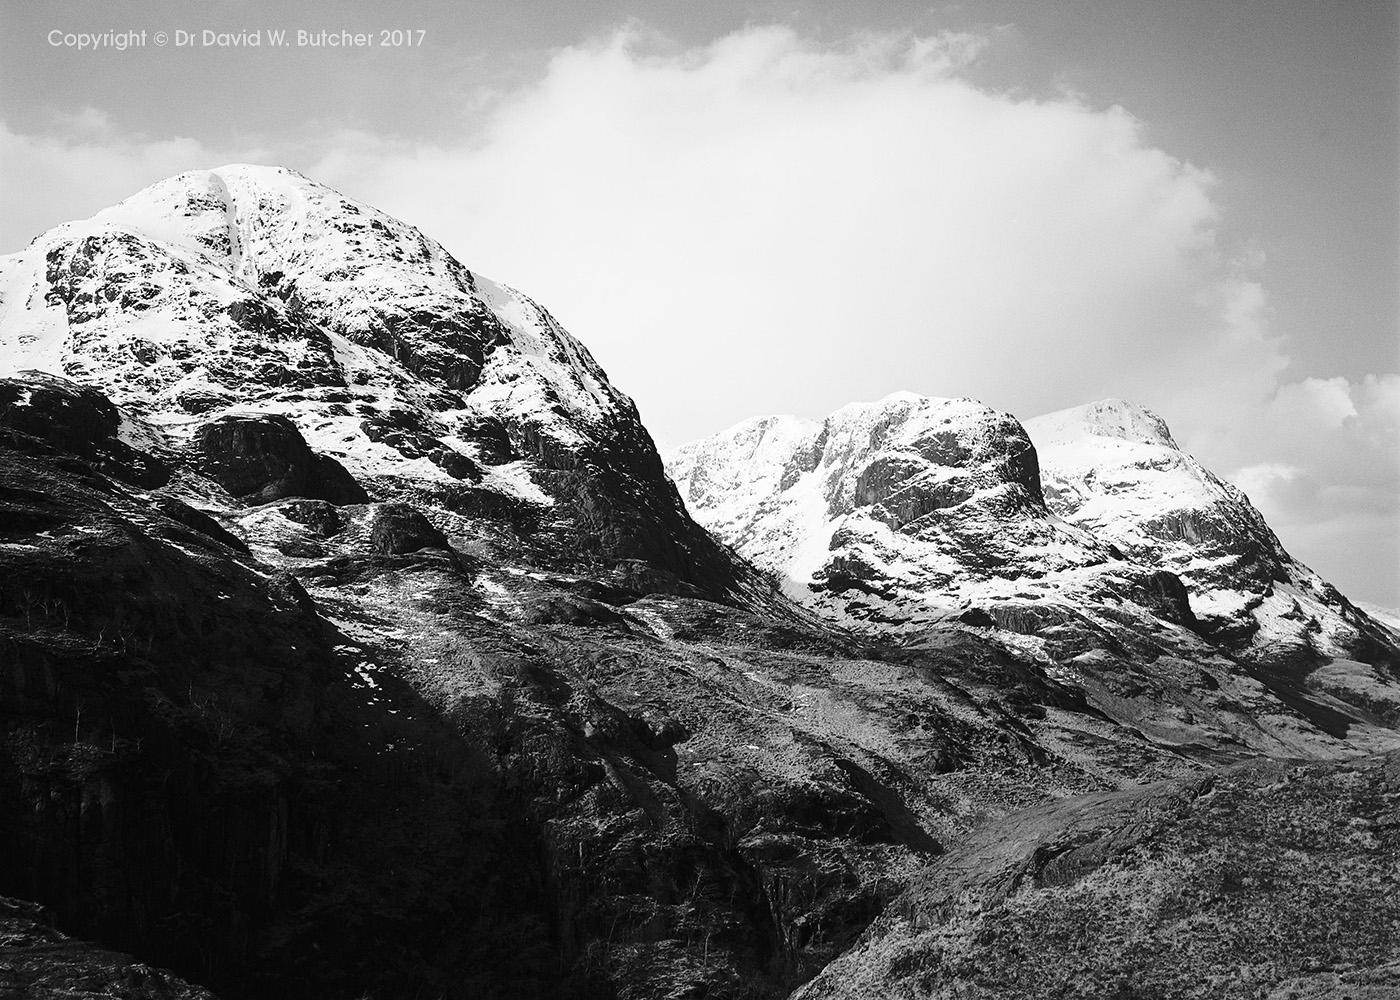 Three Sisters of Glen Coe, Scotland